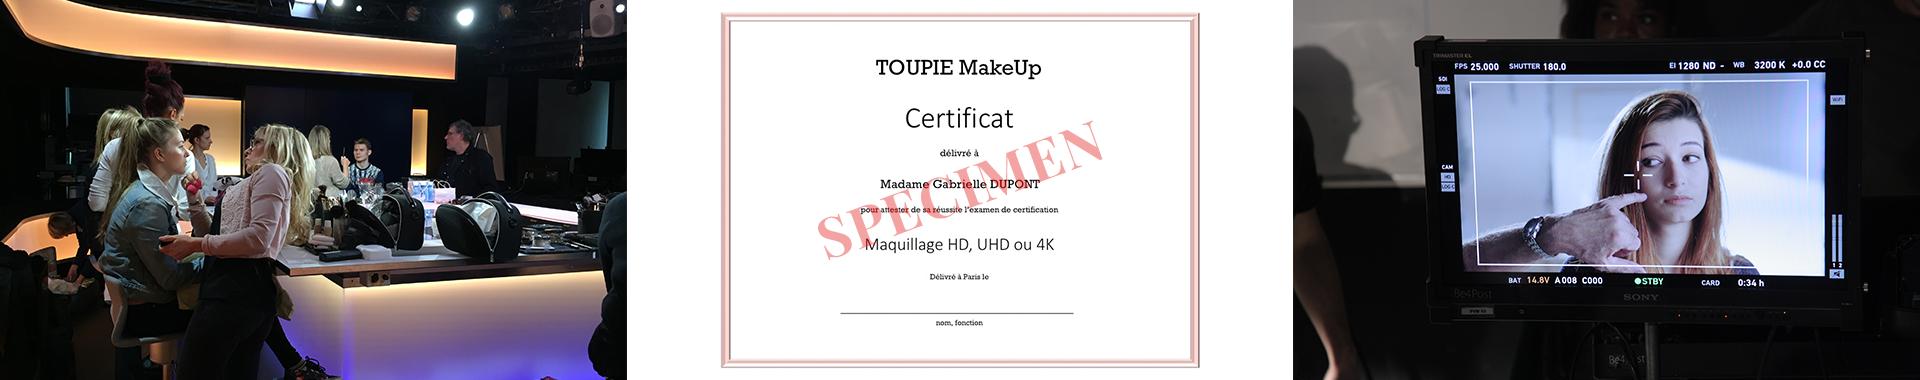 picture_makeup_certificat_4h